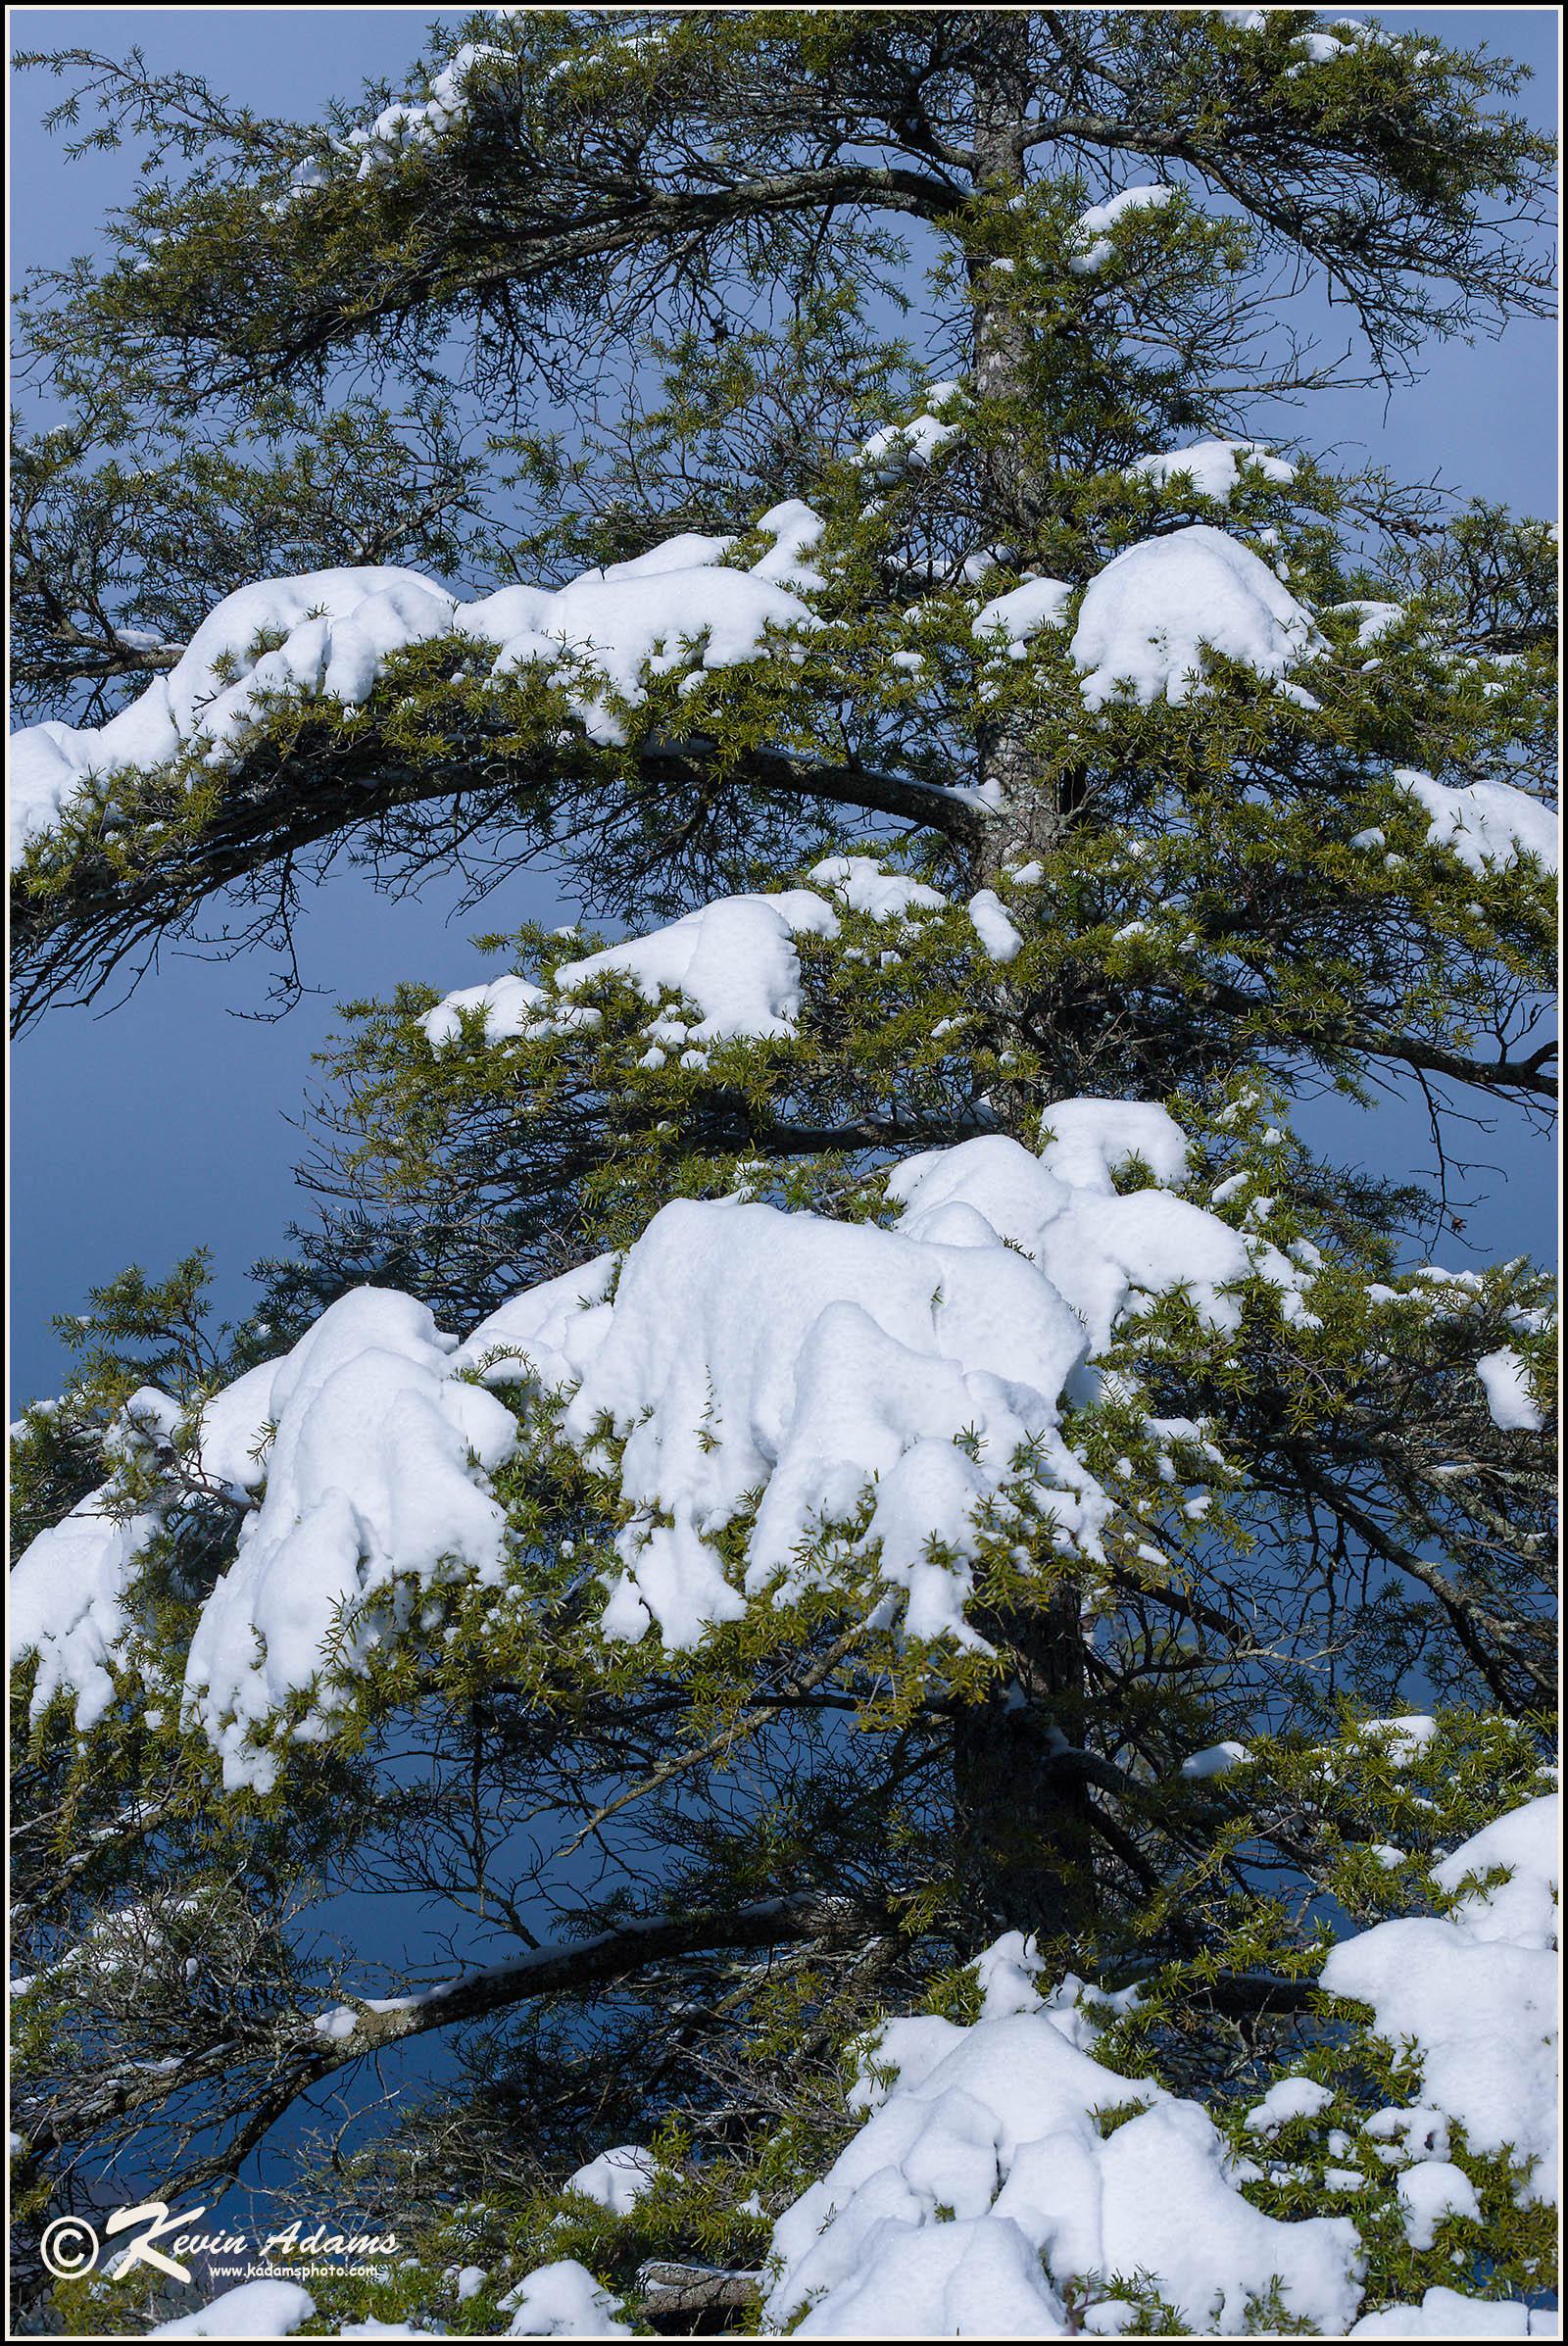 Hemlock tree at Linville Falls